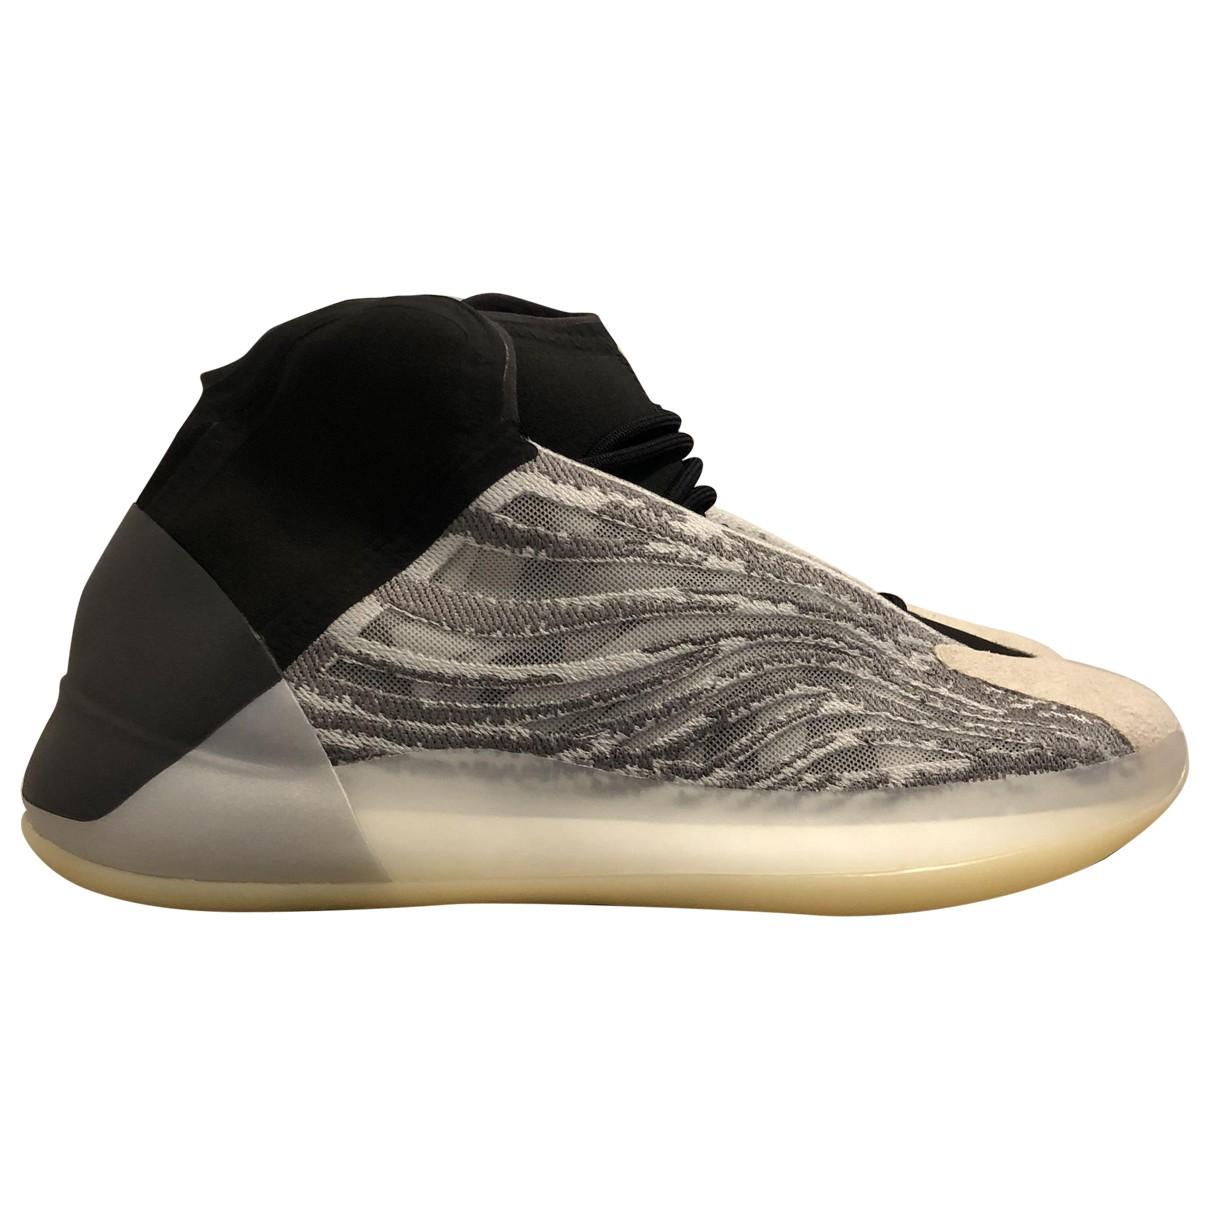 Yeezy X Adidas QNTM BSKTBL Sneakers in  Grau Kautschuk